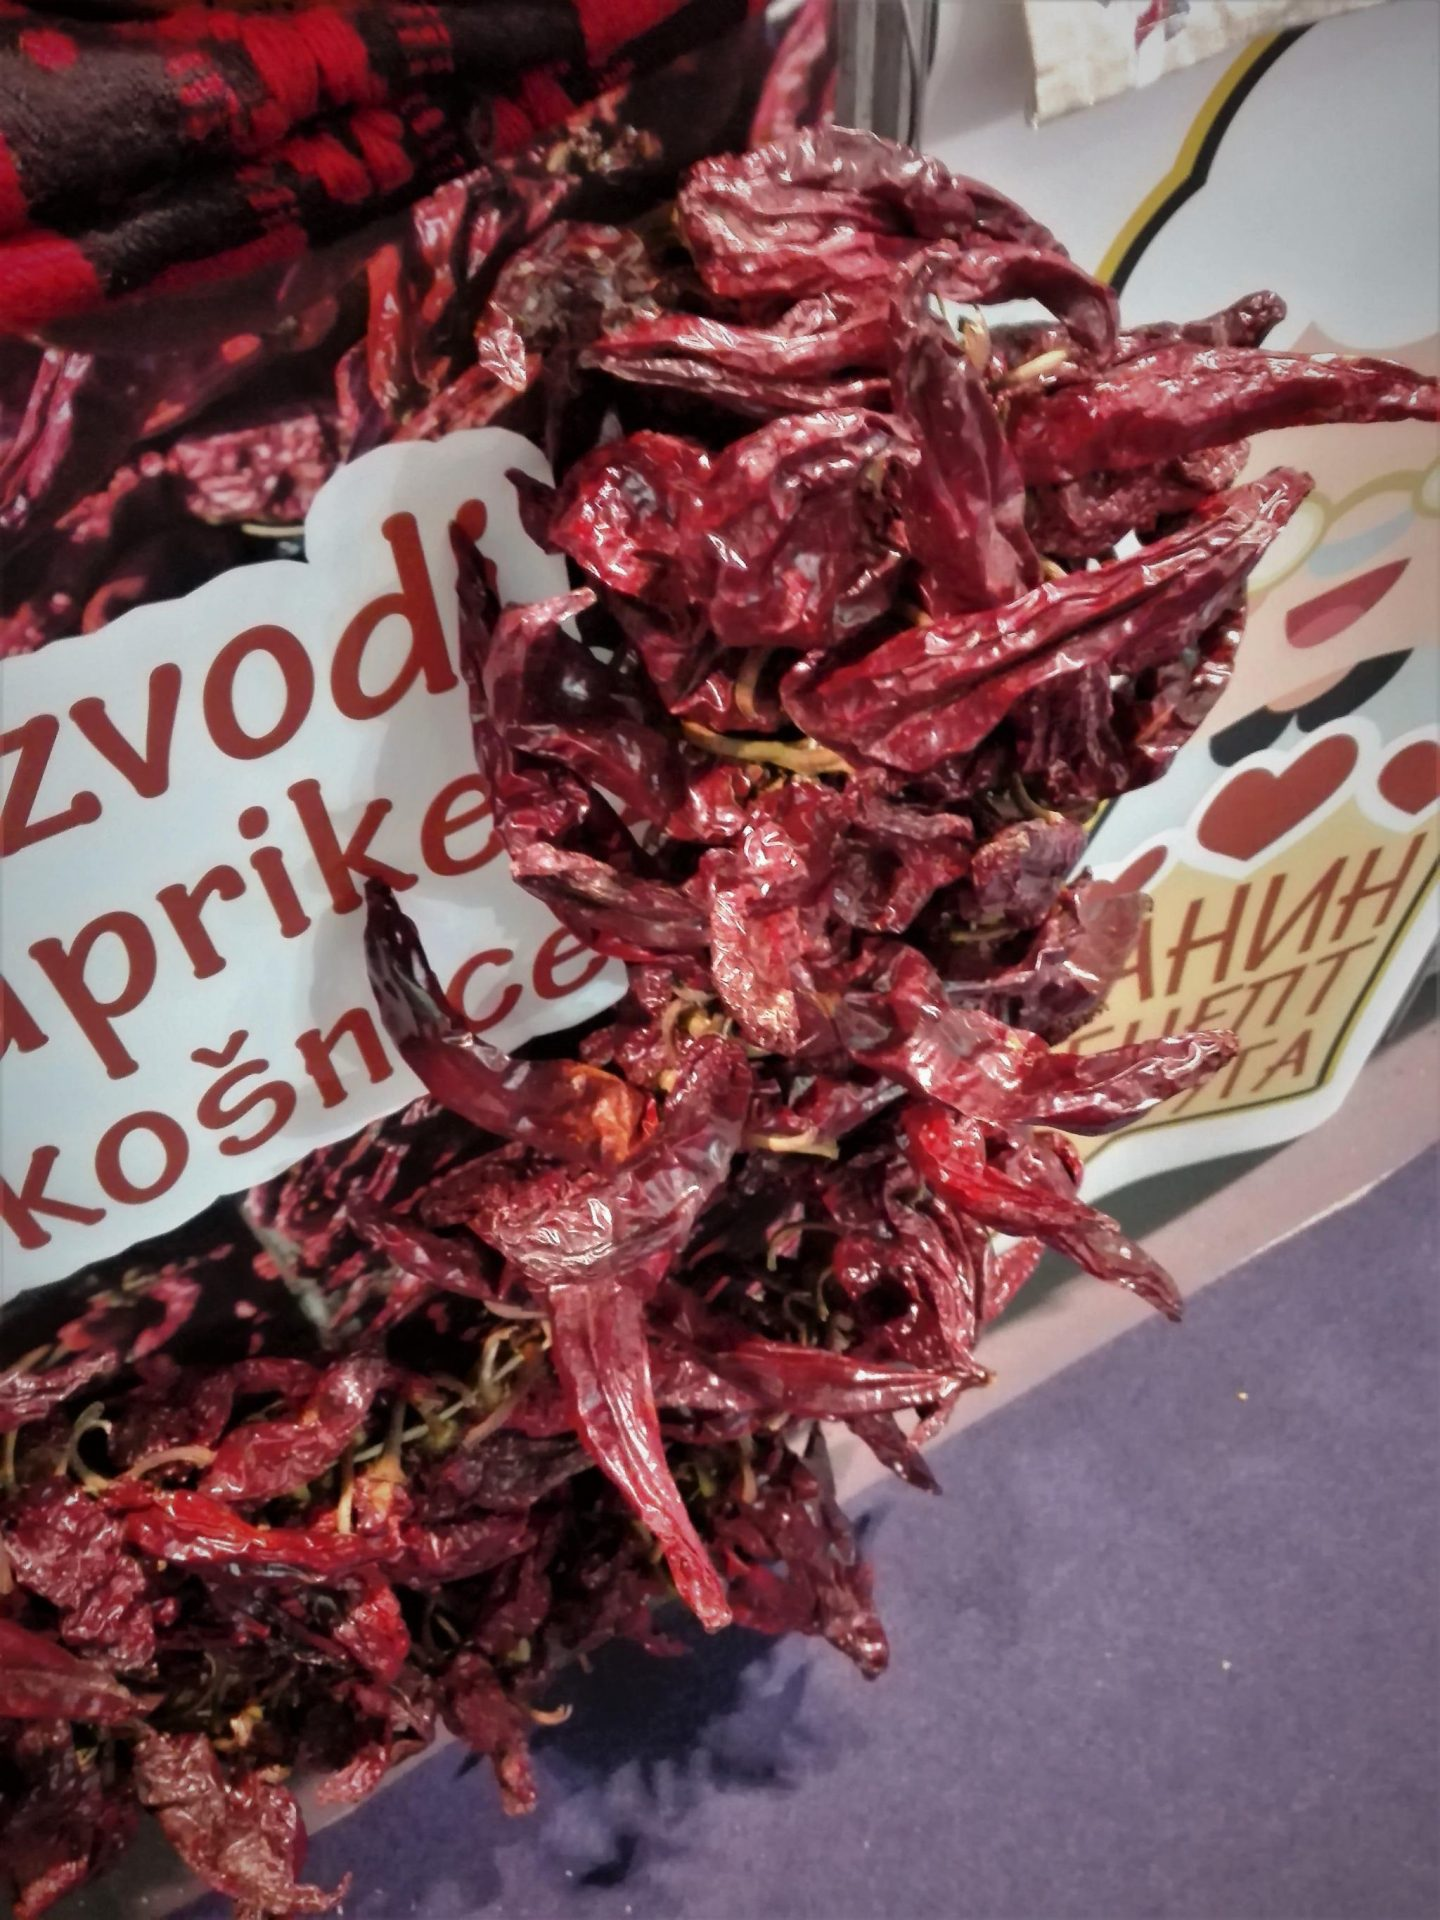 Domaće - paprika iz Lokošnice © According to Kristina